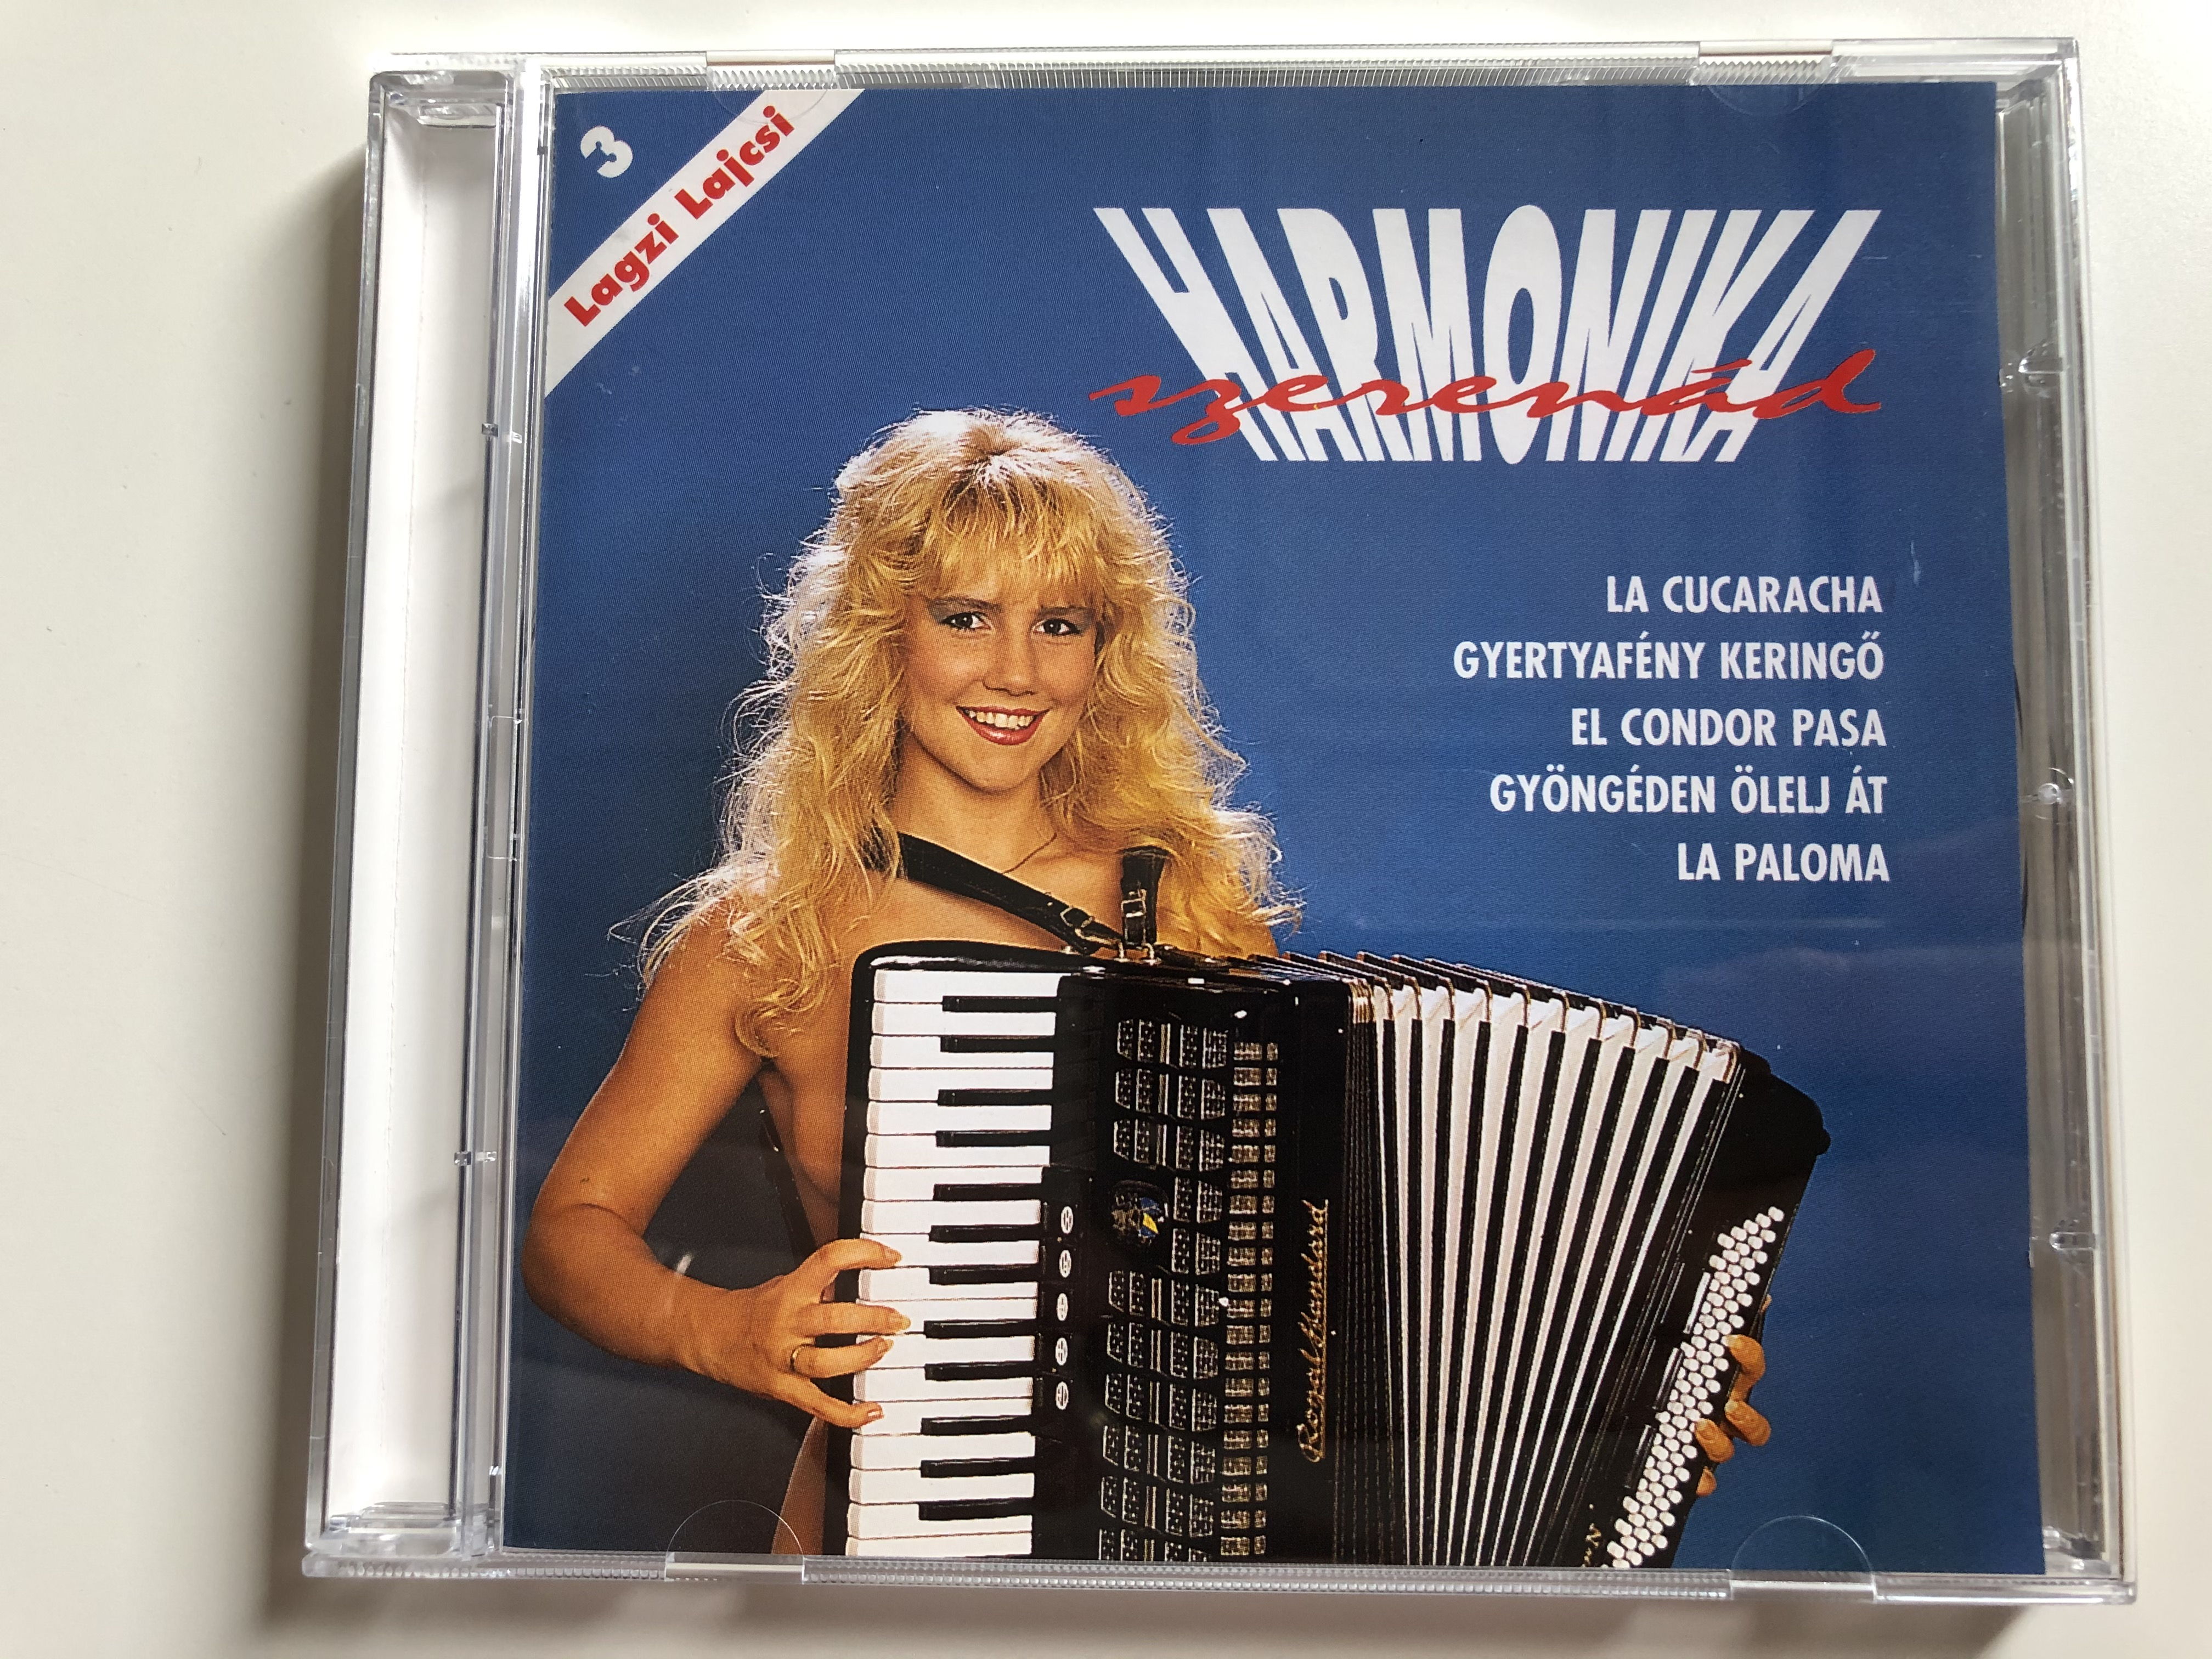 lagzi-lajcsi-3-harmonika-szeren-d-la-cucaracha-gyertyaf-ny-kering-el-condor-pasa-gy-ng-den-lelj-t-la-paloma-hungaroton-audio-cd-2001-hcd-37547-1-.jpg